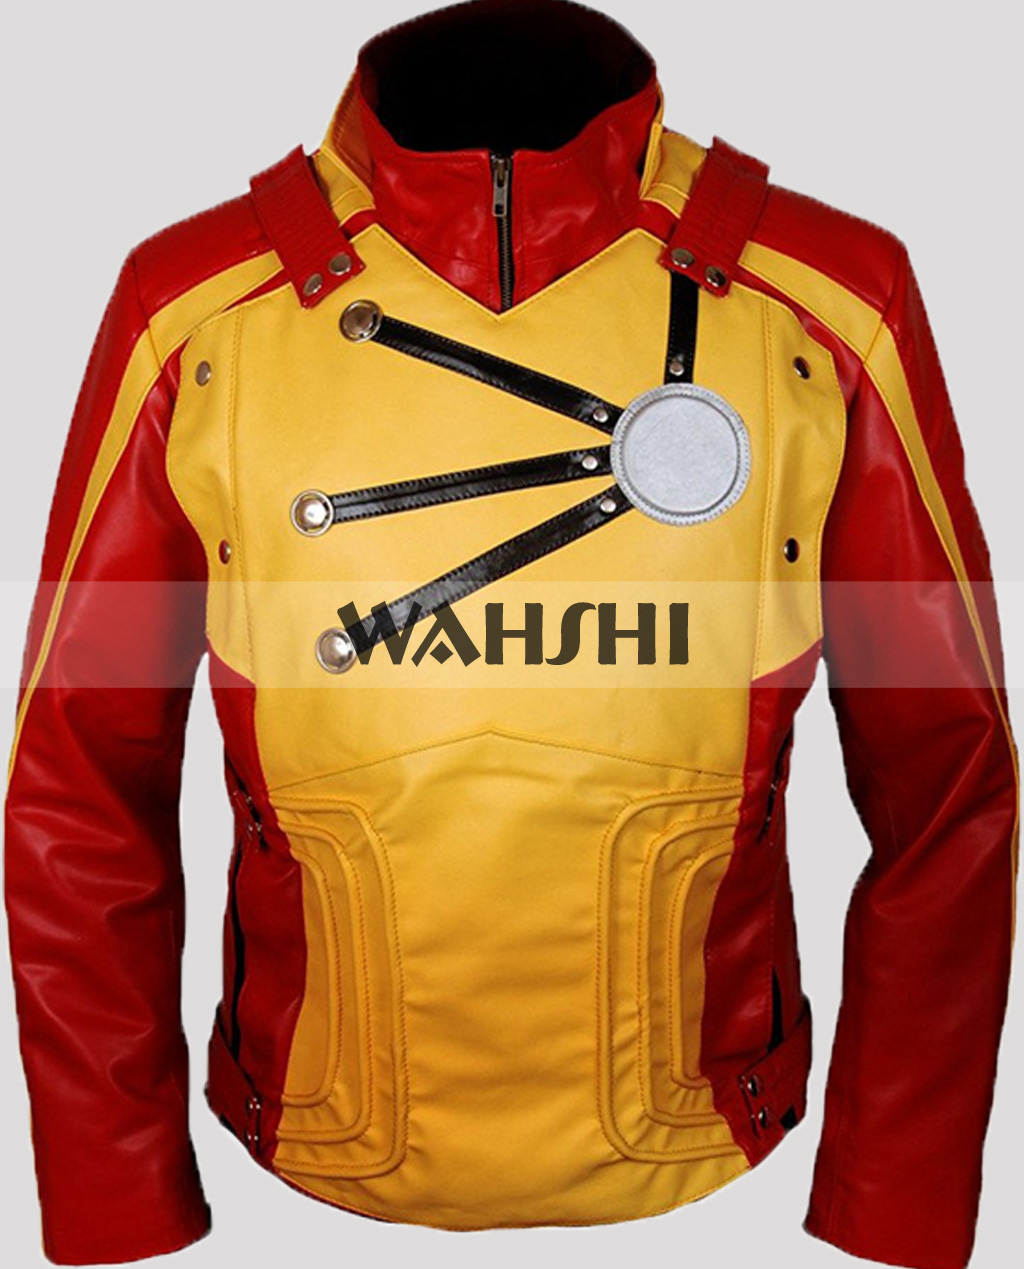 Legends-of-tomorrow-firestorm-jacket-costume